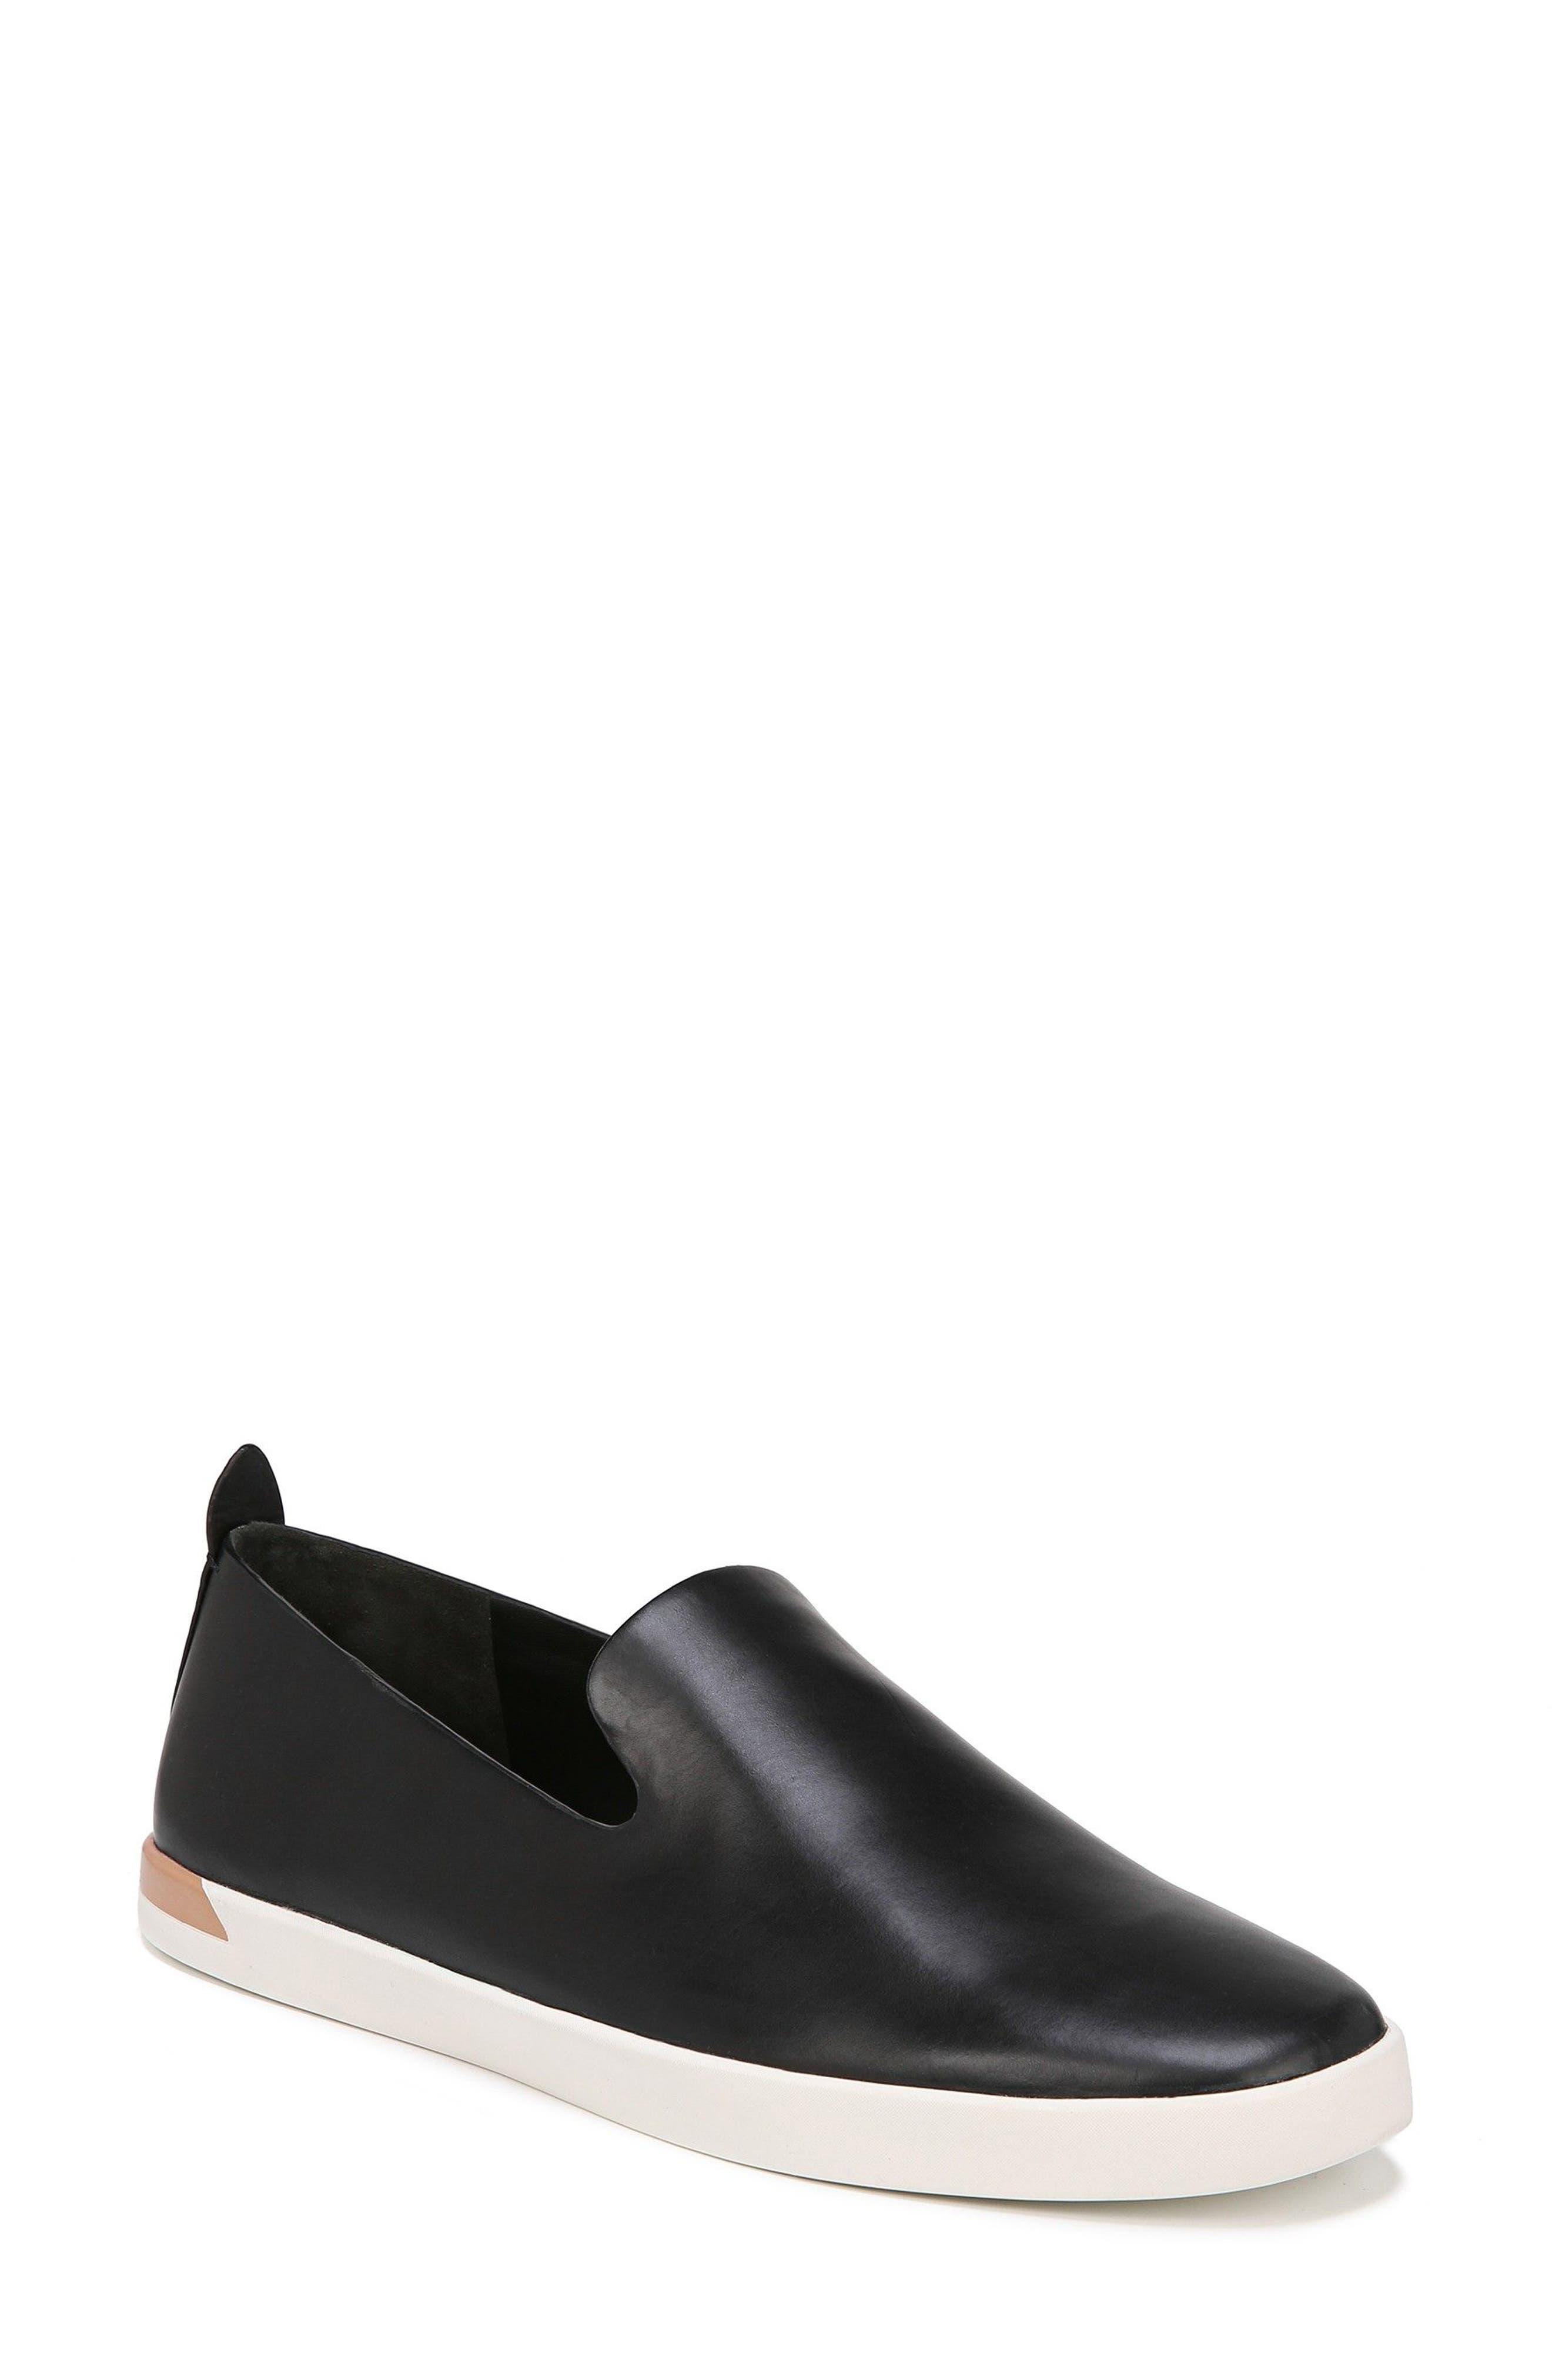 Vero Sneaker,                             Main thumbnail 1, color,                             Black Leather